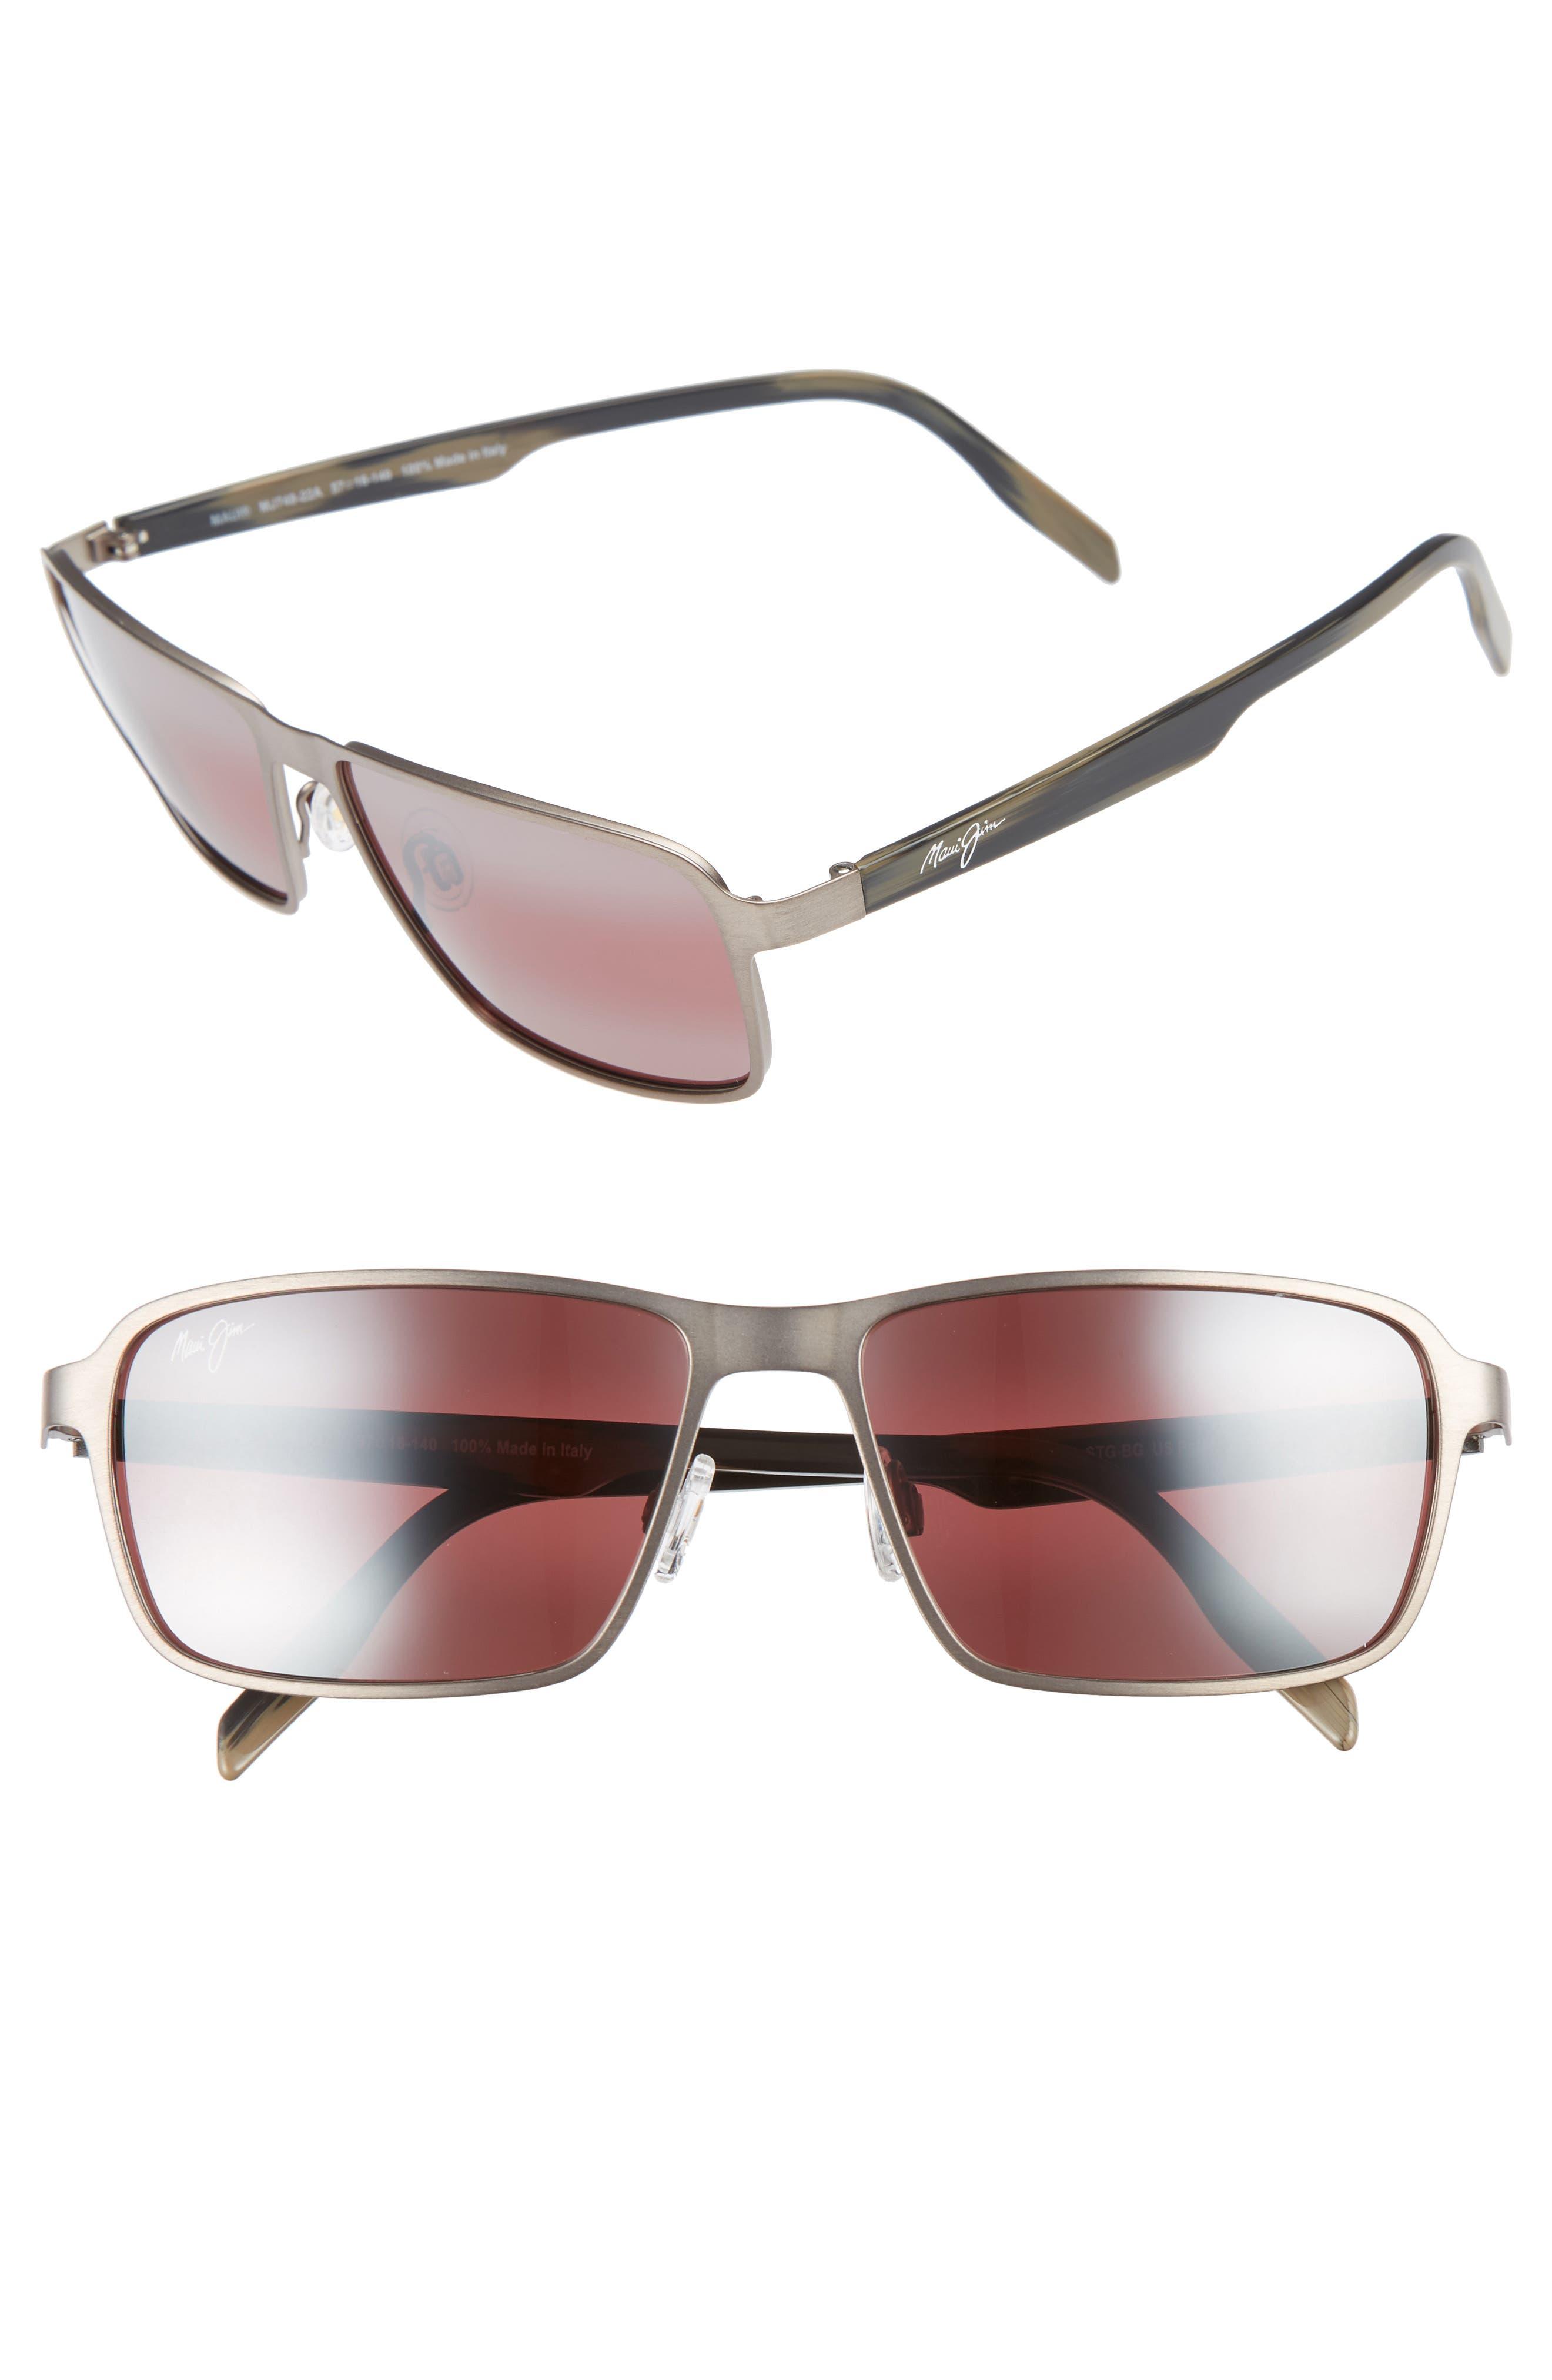 Glass Beach PolarizedPlus<sup>®</sup>2 54mm Sunglasses,                             Main thumbnail 1, color,                             BRUSHED SAND